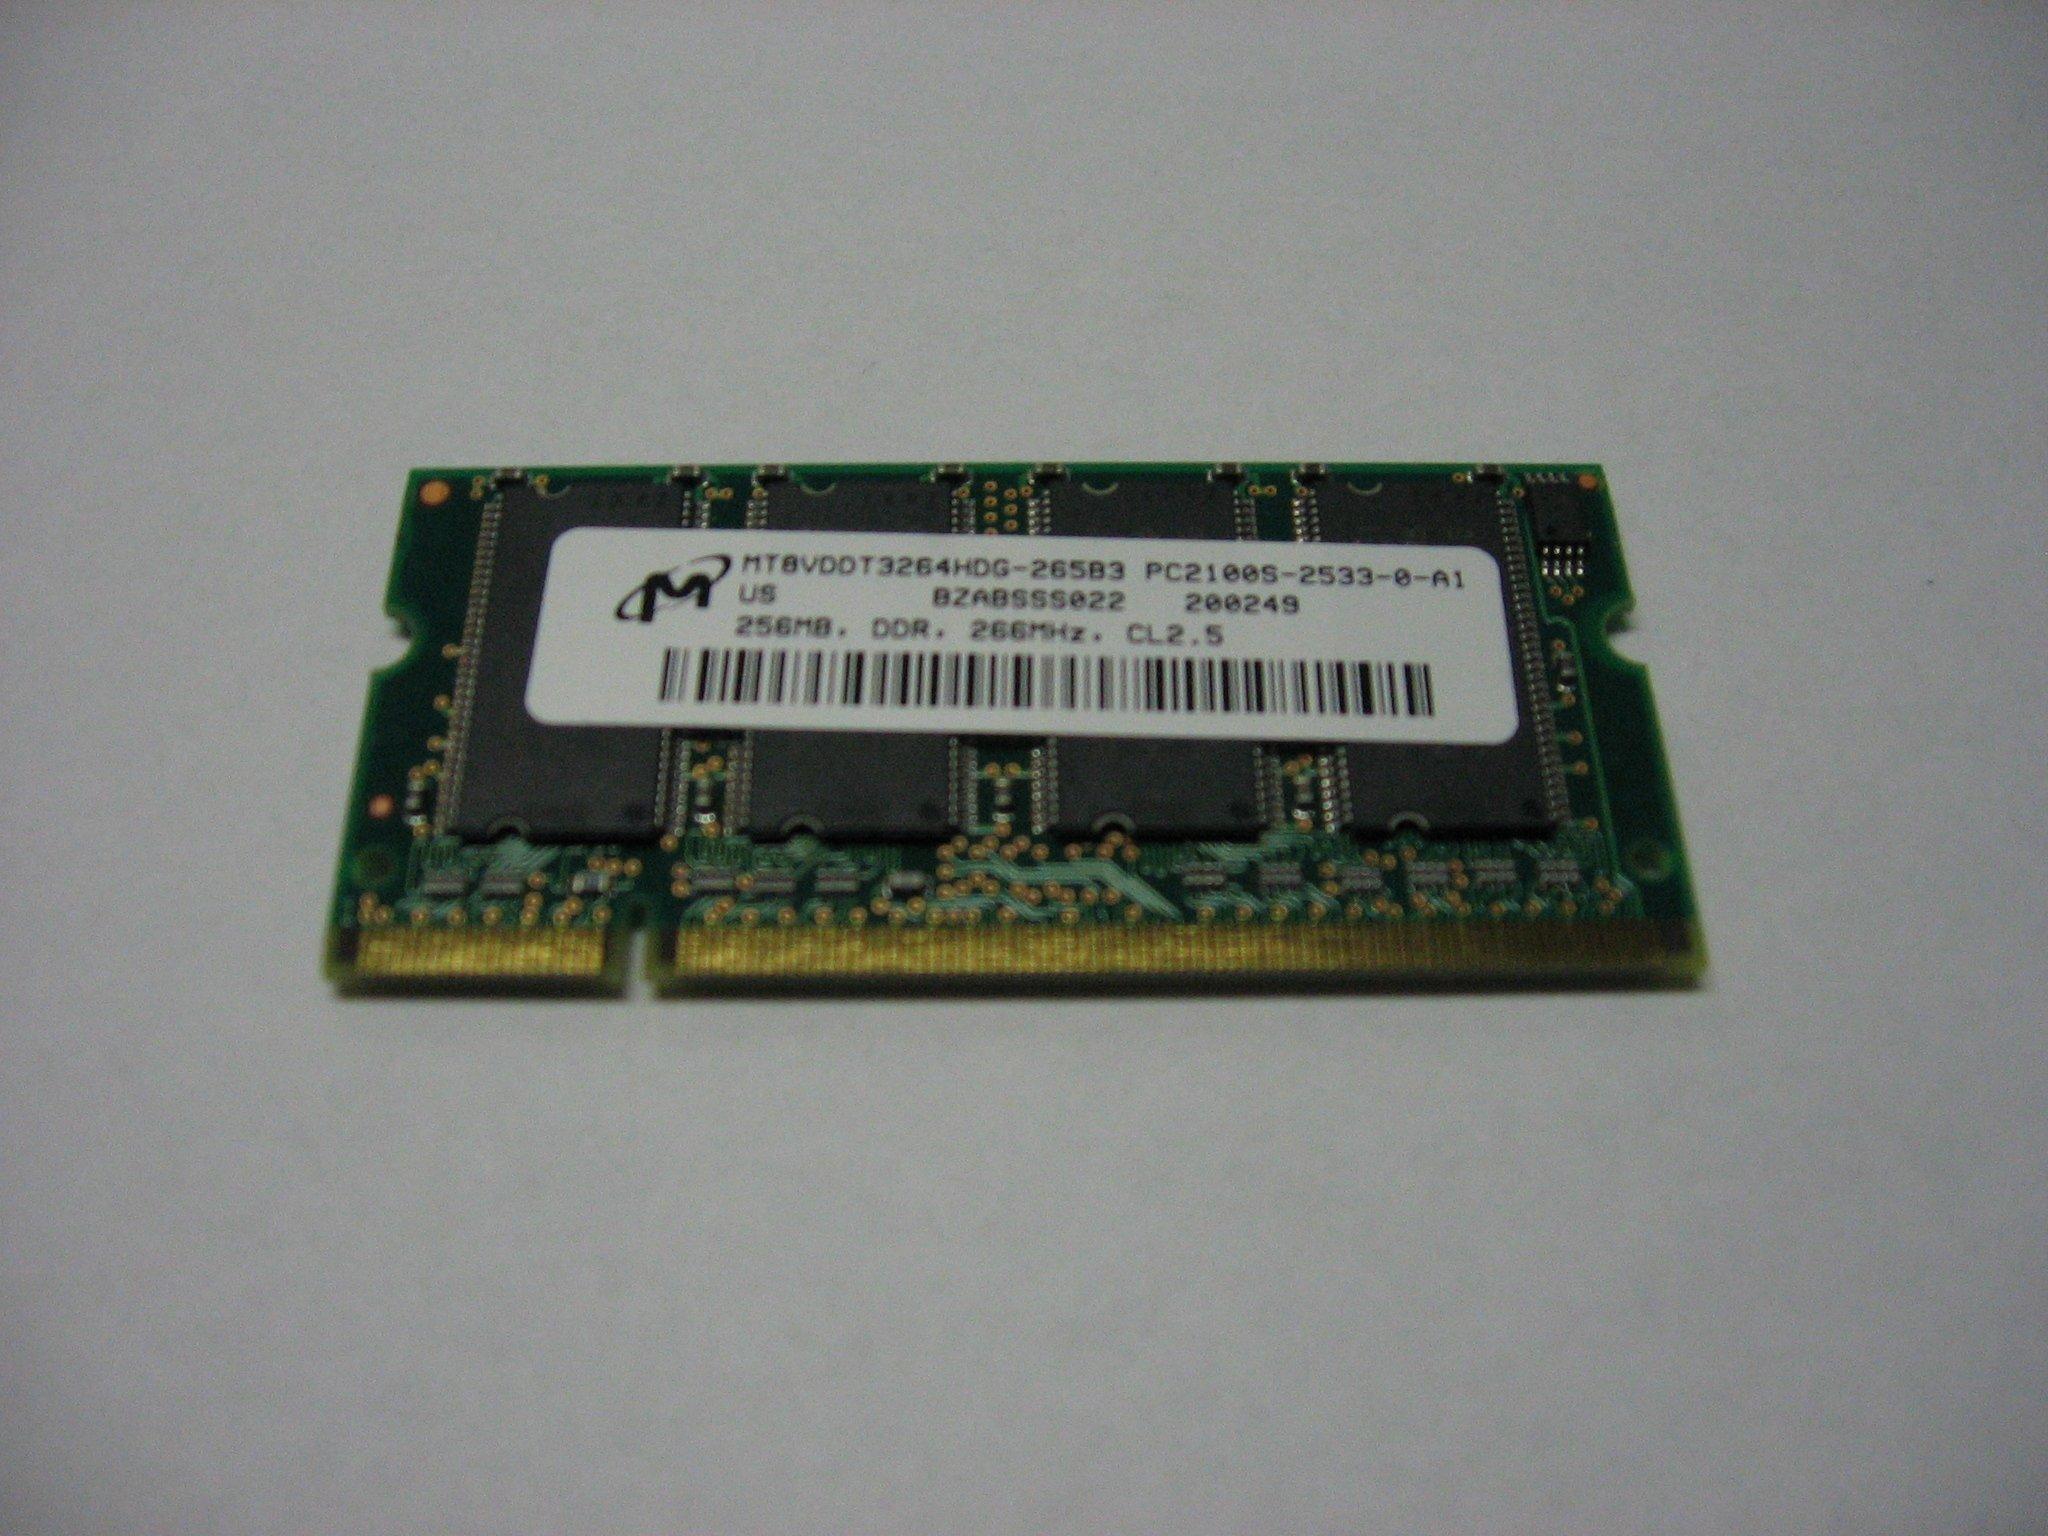 Pamięć RAM MT8VDDT3264HDG-265b3 DDR 256MB - Opole